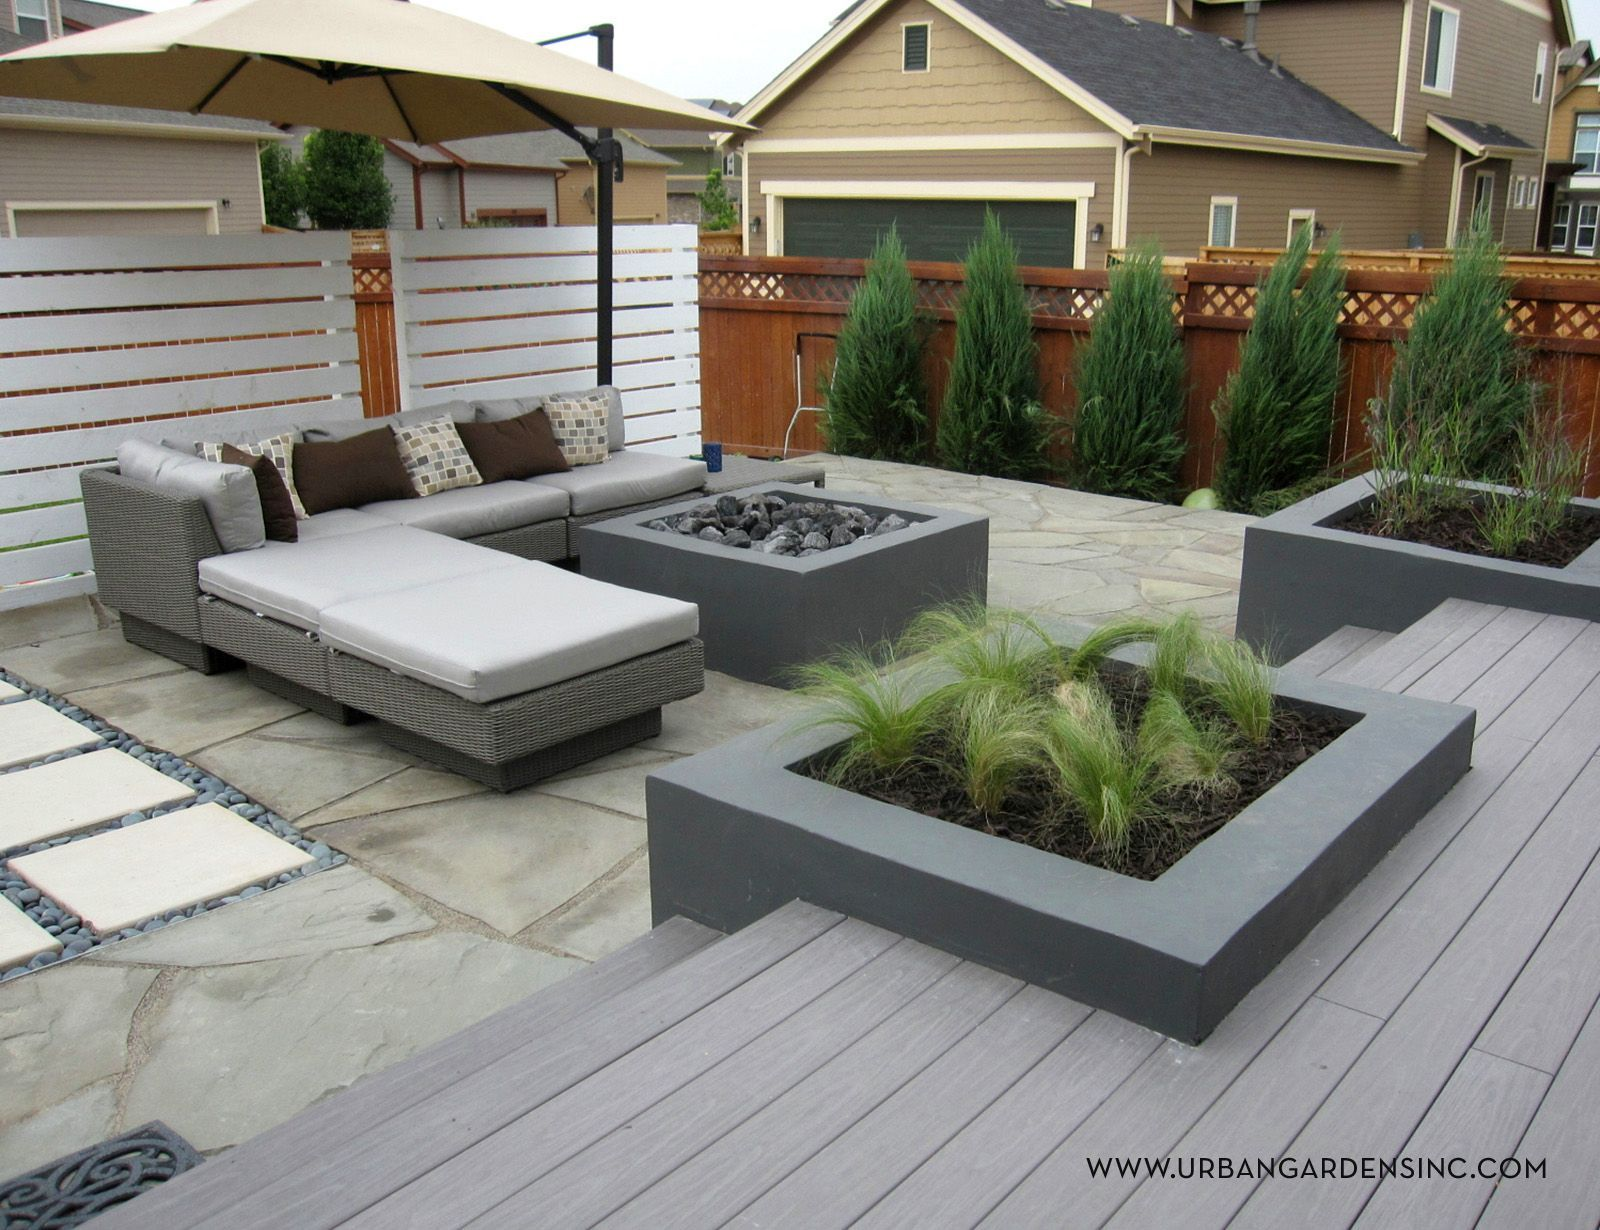 Home Landscape Designs - Urban Gardens - Landscape Design #Interiordesignideasandthings